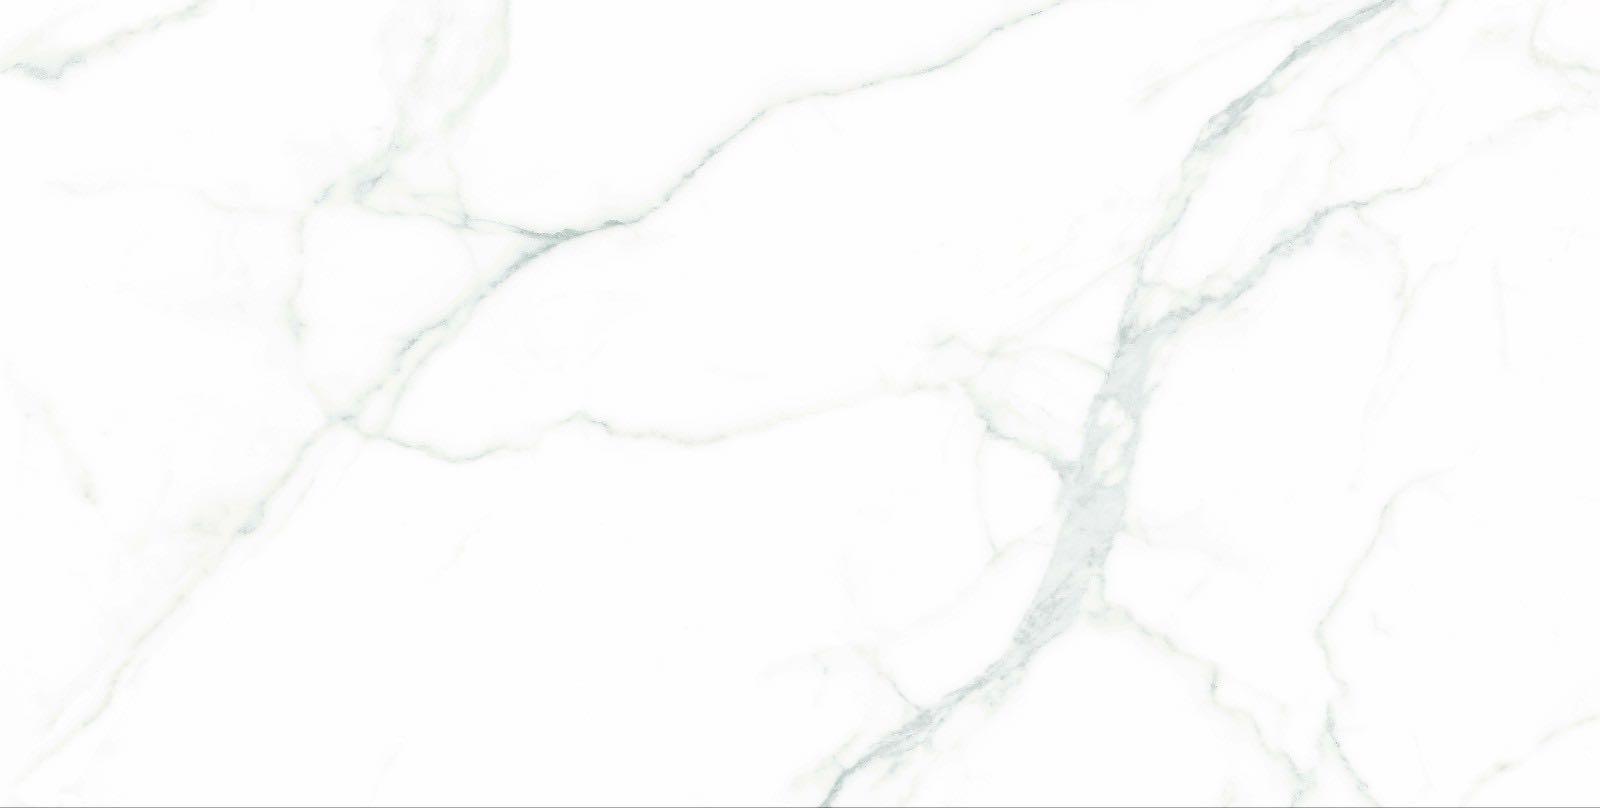 大板 / CTB918017 / 900x1800mm